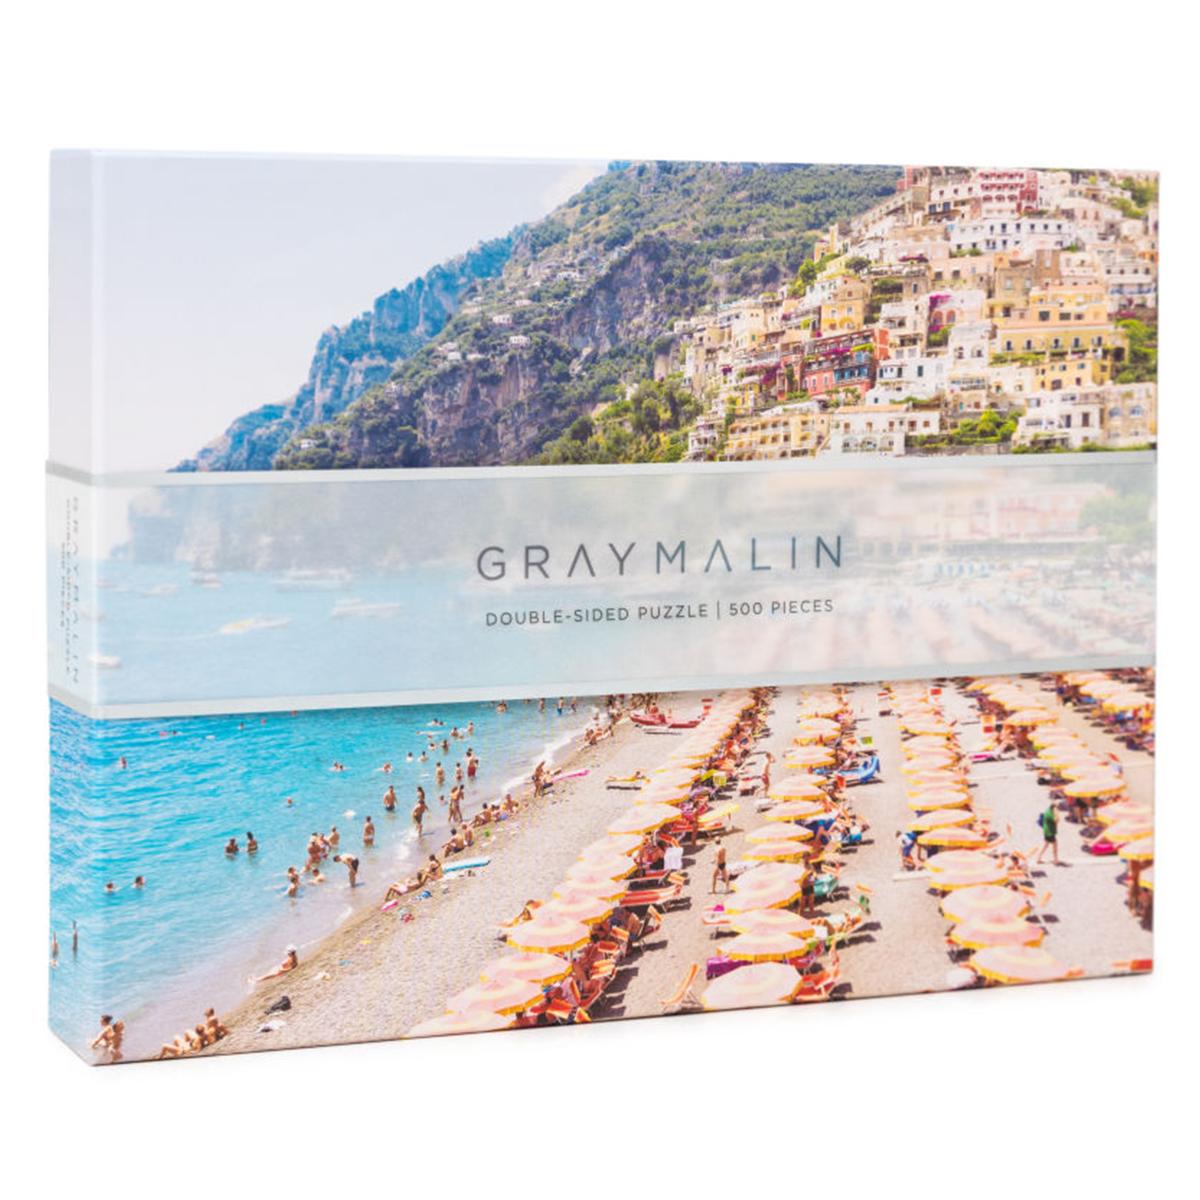 image of Gray Malin Italy 2-Sided Puzzle box